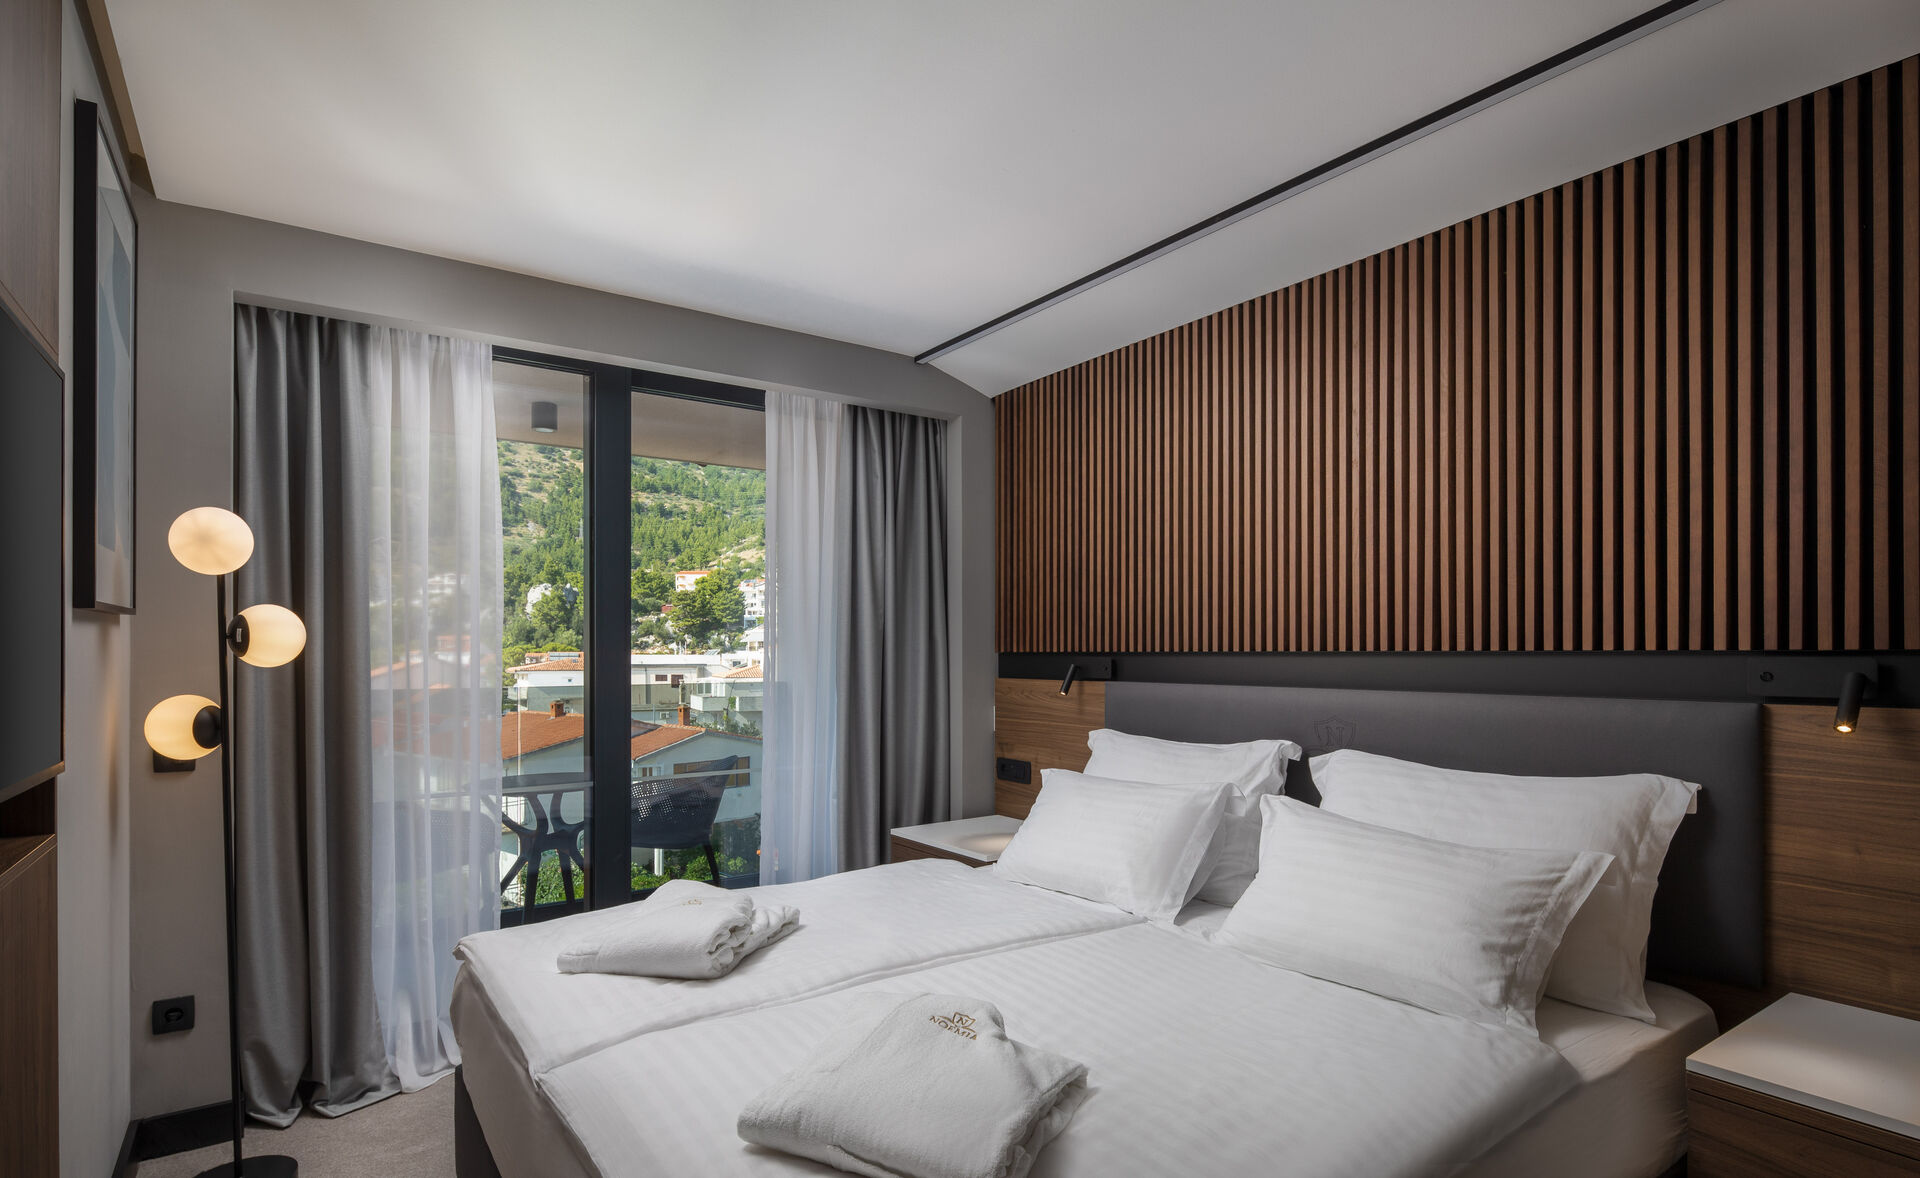 https://cms.satur.sk/data/imgs/tour_image/orig/suite_hotel-noemia-1-1949990.jpg